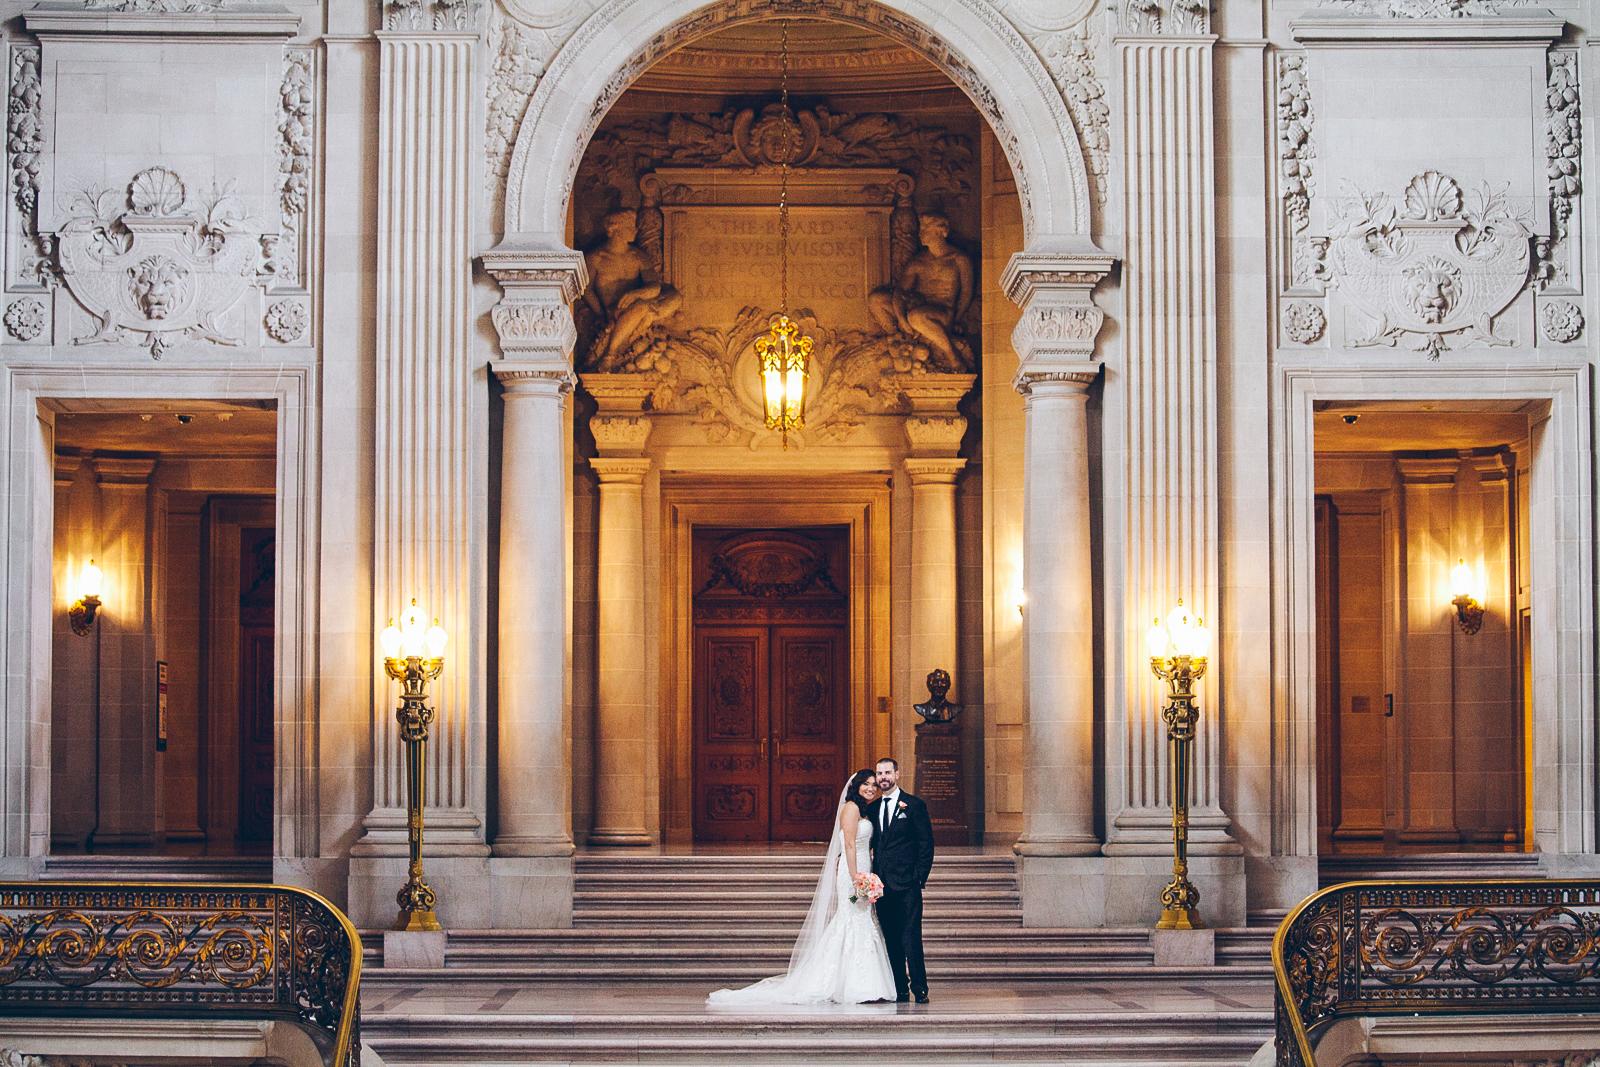 San_francisco_city_hall_wedding_photography_meegan_travis_ebony_siovhan_bokeh_photography_50.jpg